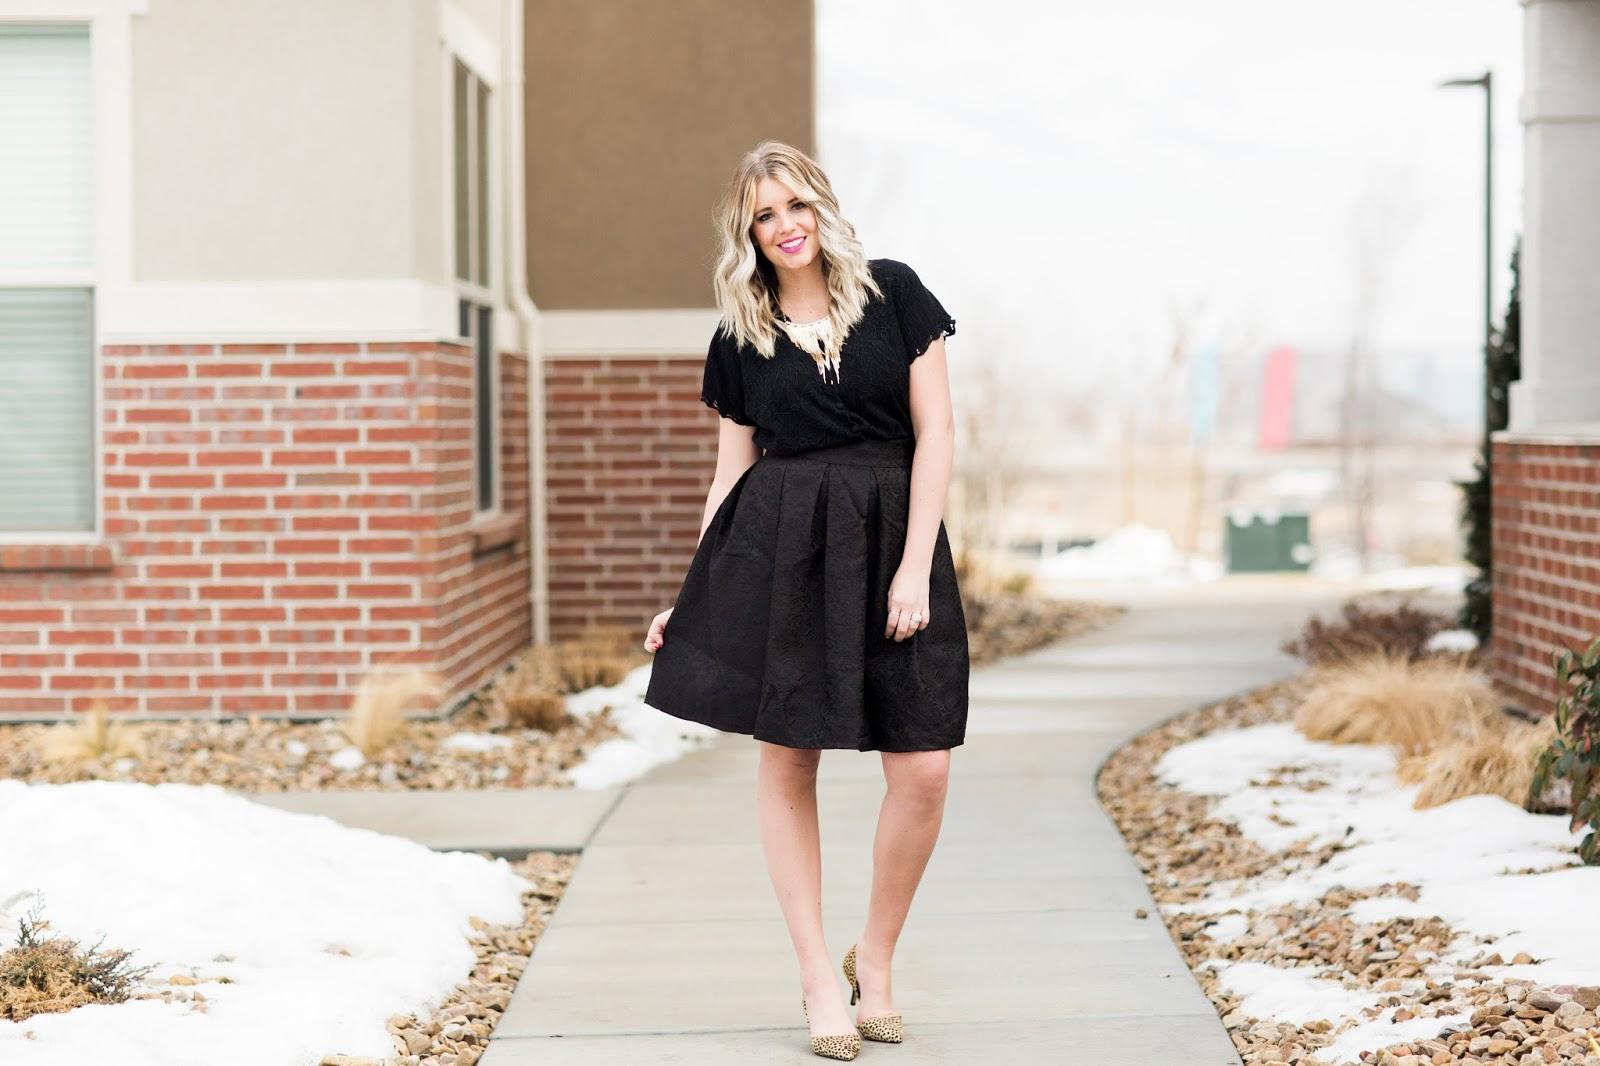 Black Outfit, Utah Fashion Blogger, Tara Lynn's